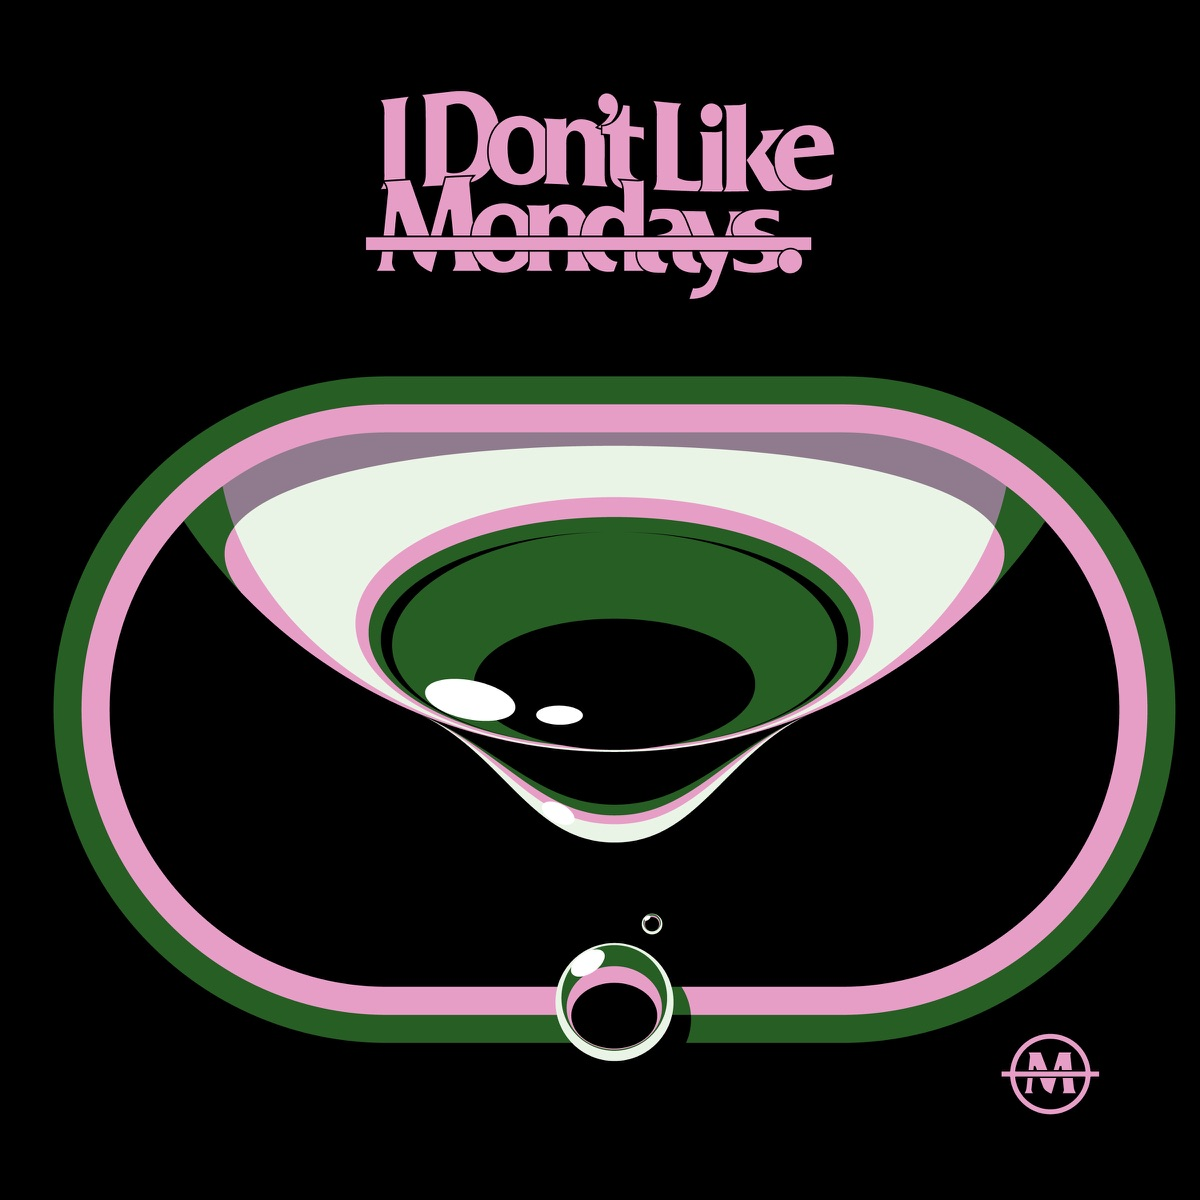 『I Don't Like Mondays. - 馬鹿』収録の『馬鹿』ジャケット